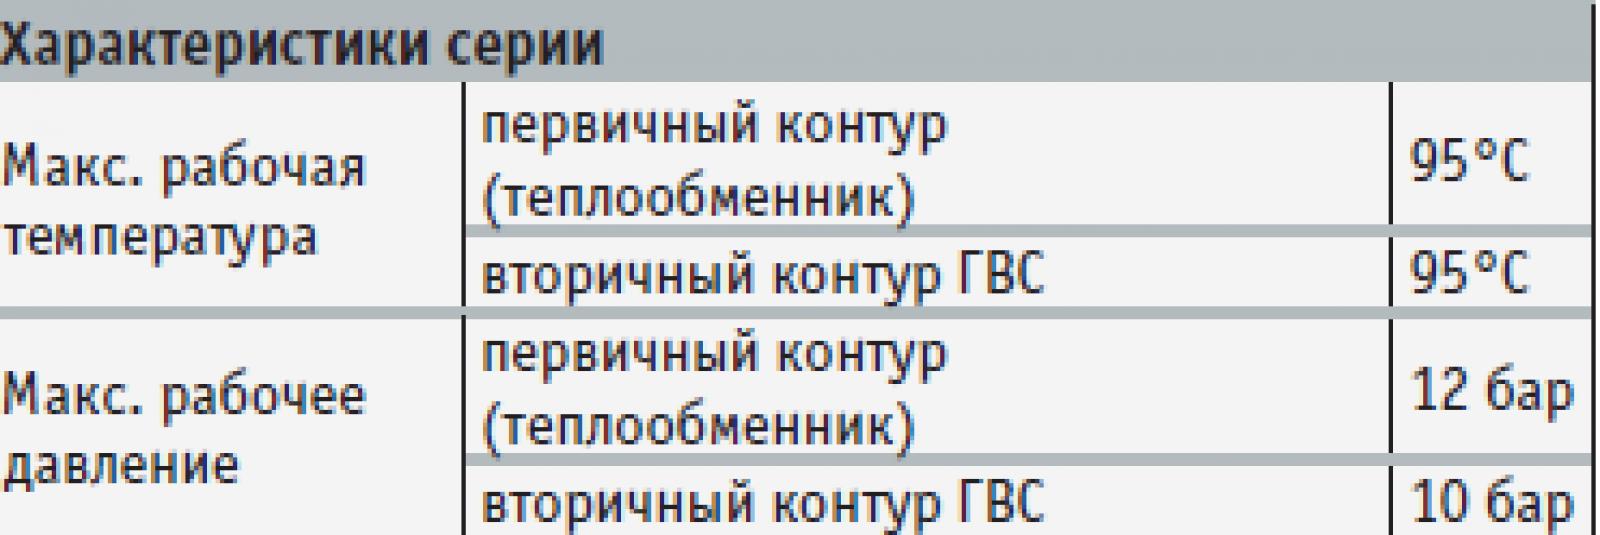 vodonagrevateli_dedietrich_l160250_2